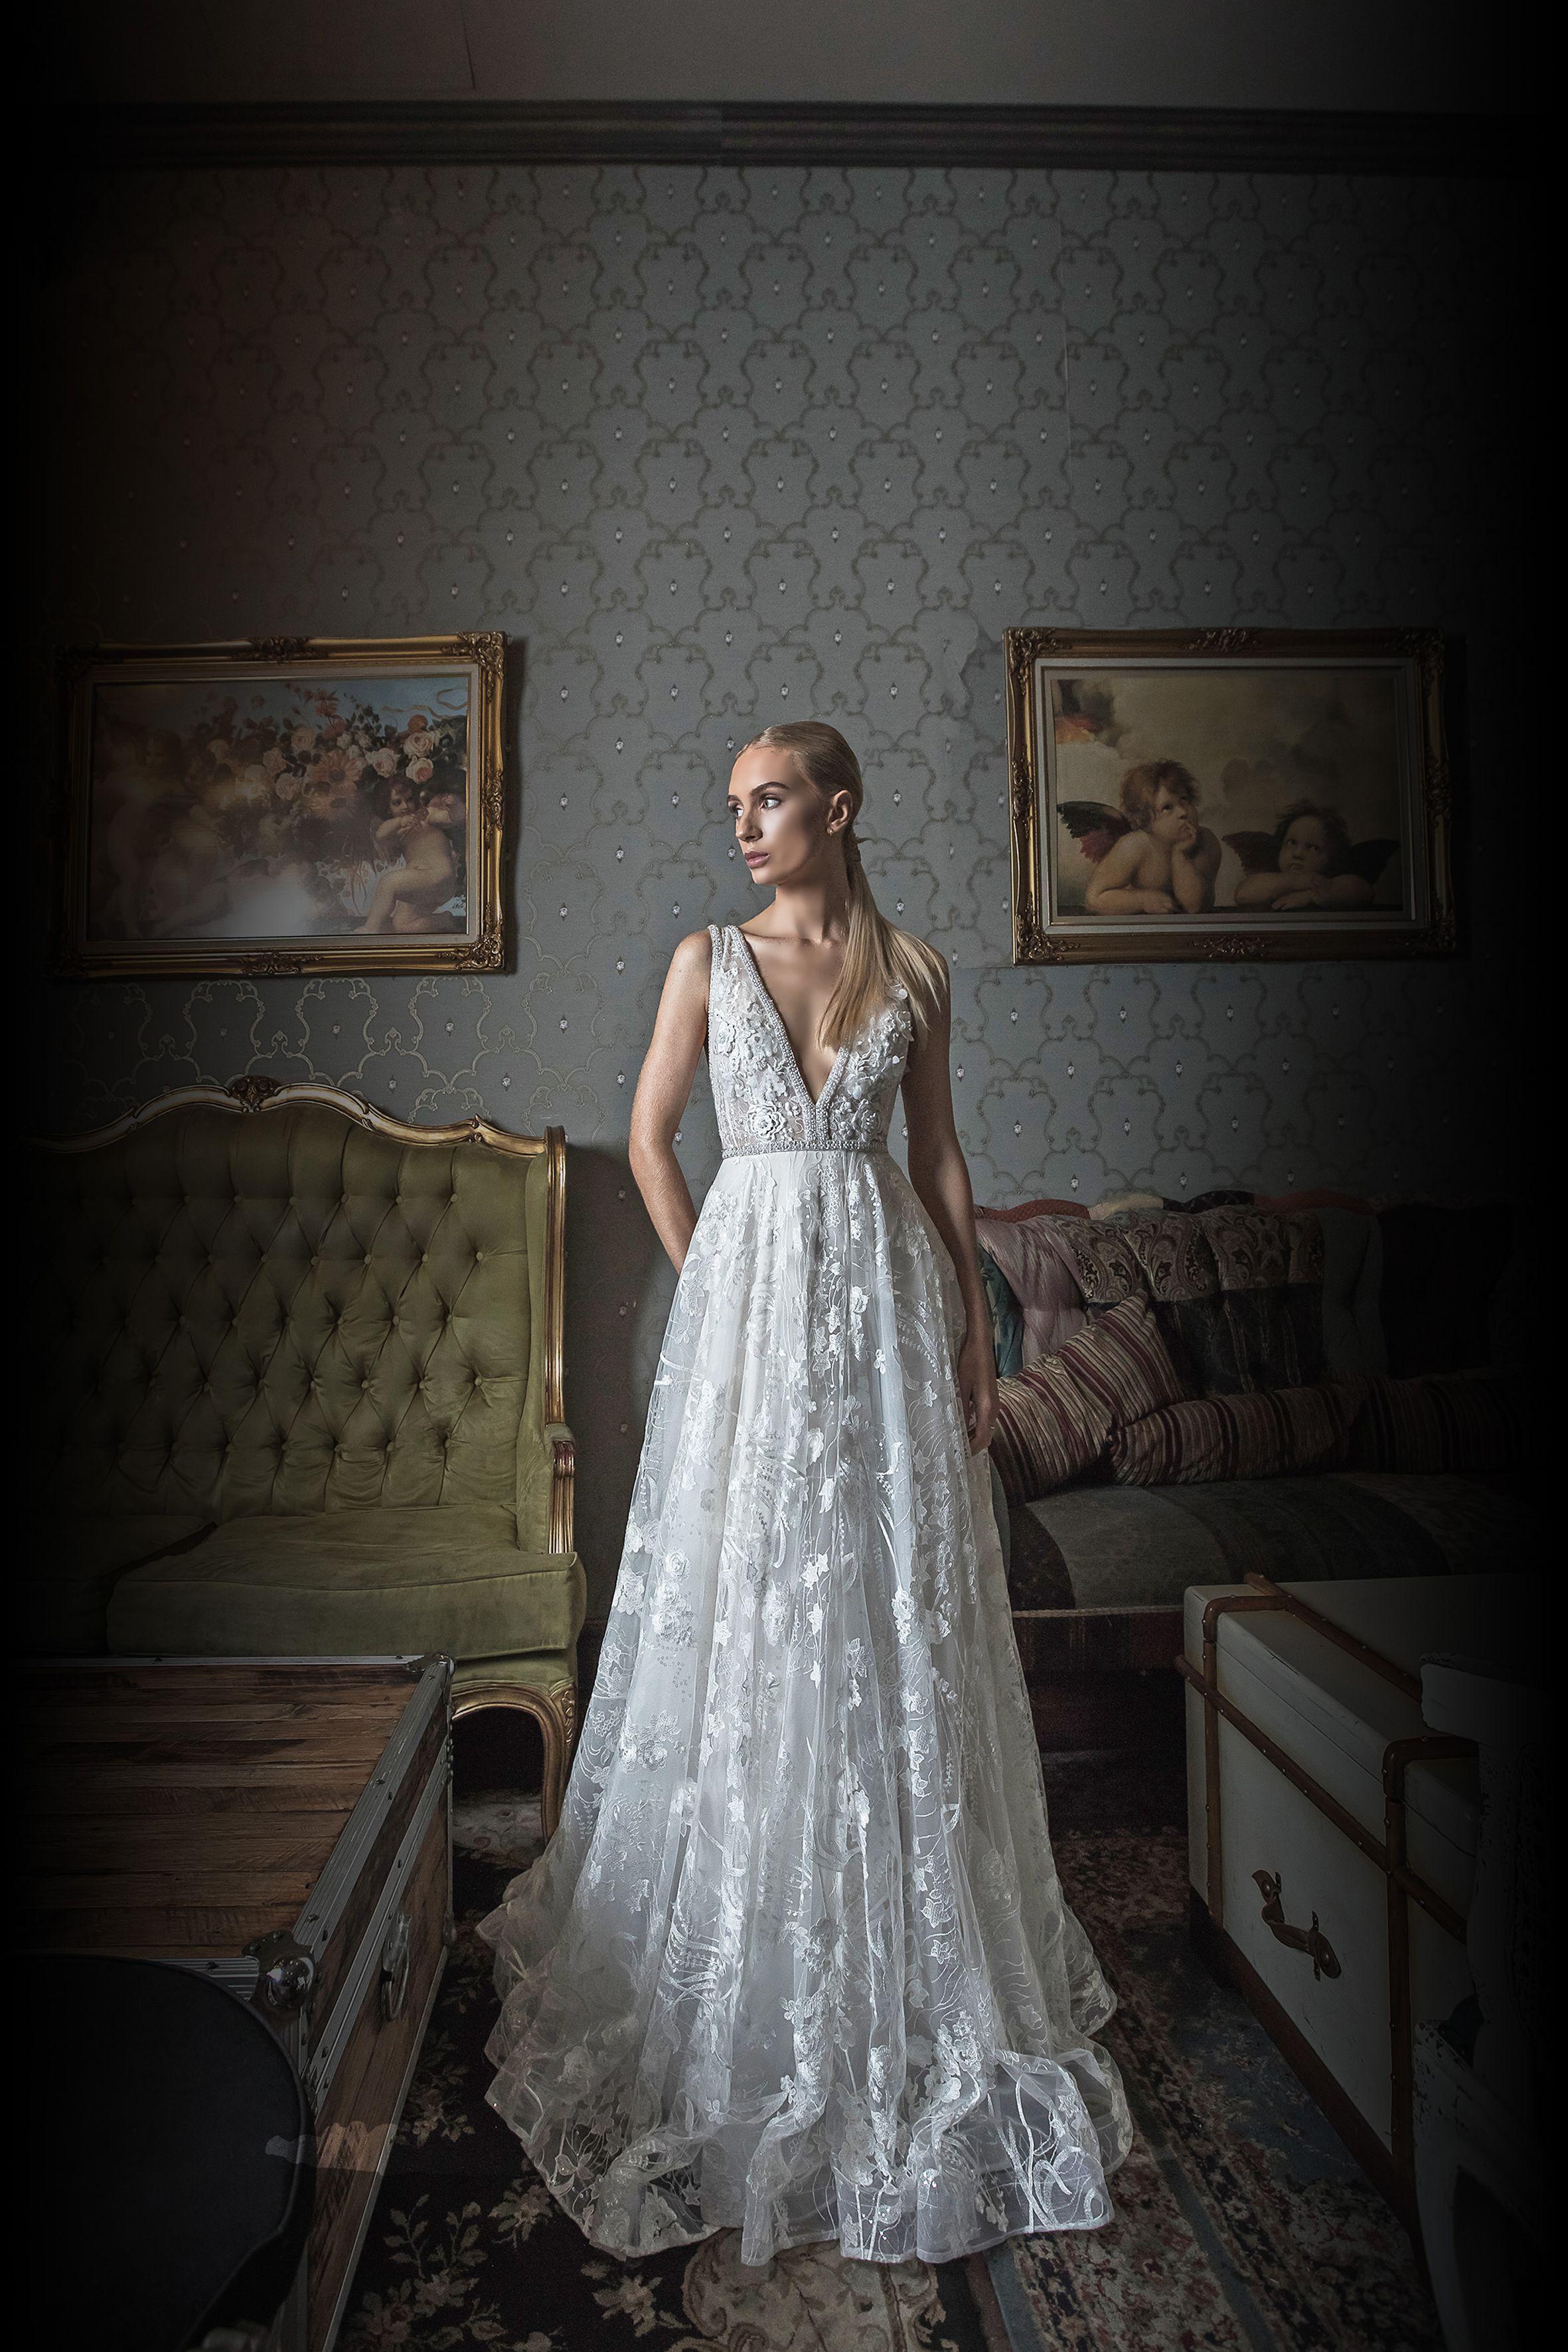 Zavanah Ava Pearl Bridal Wedding Dresses Nz Designer Bridal Gowns Long Beach Wedding Dresses [ 3543 x 2362 Pixel ]